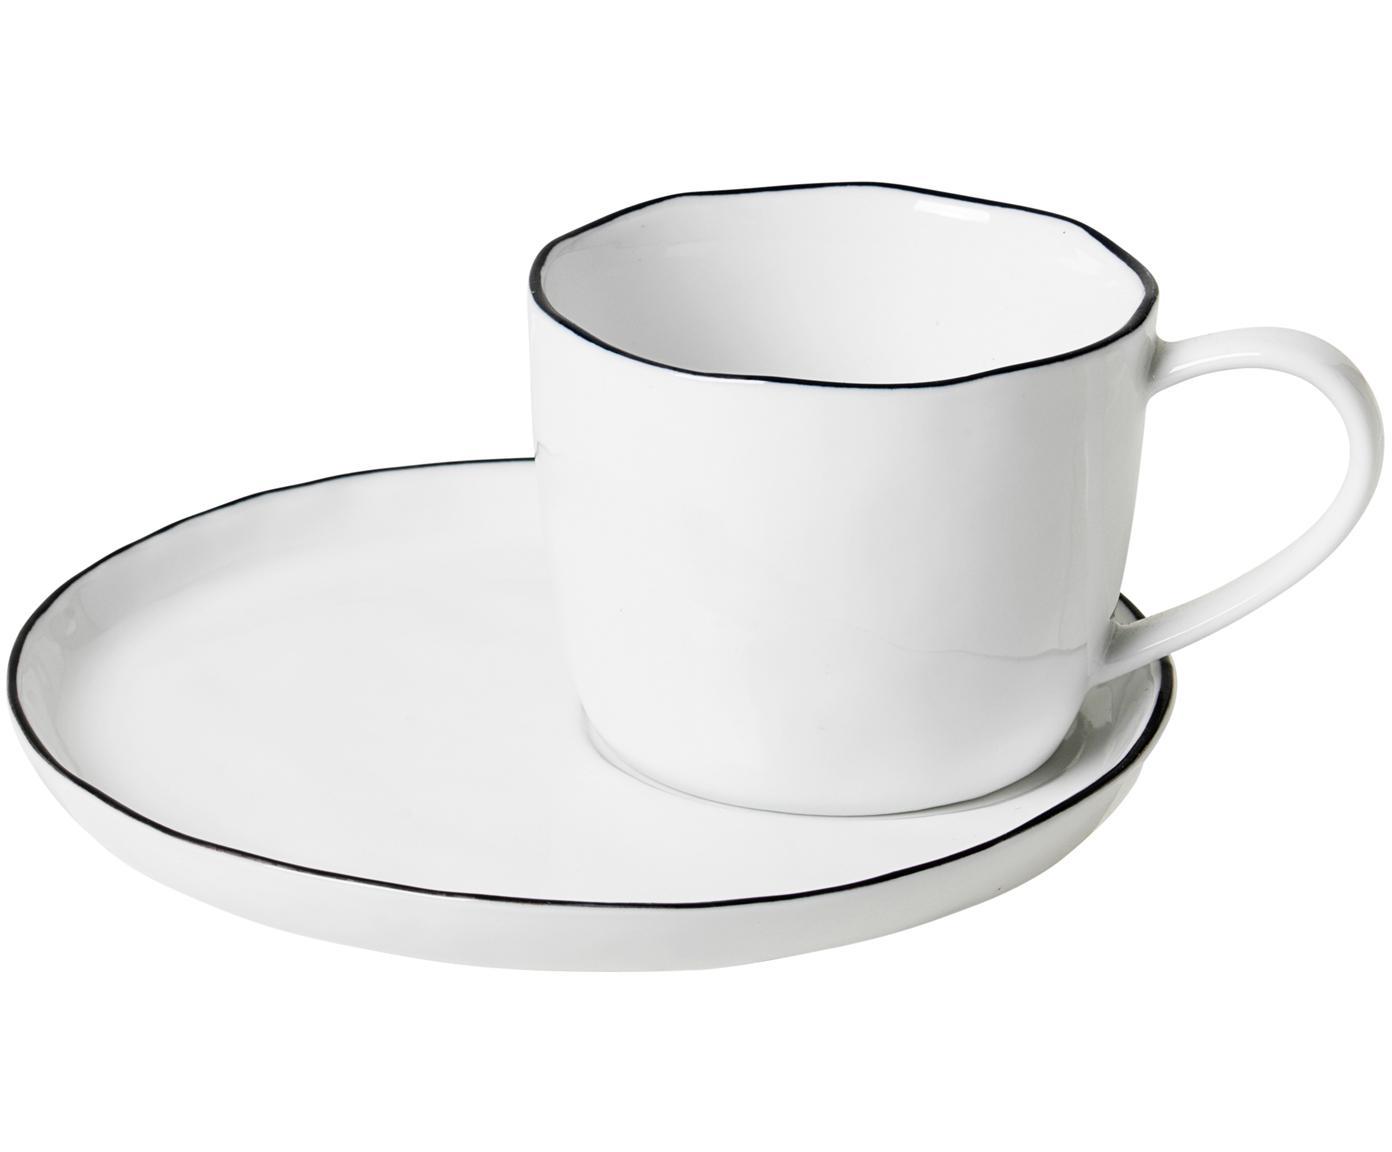 Taza con platito artesanal Salt, Porcelana, Blanco crudo, negro, Ø 8 x Al 7 cm